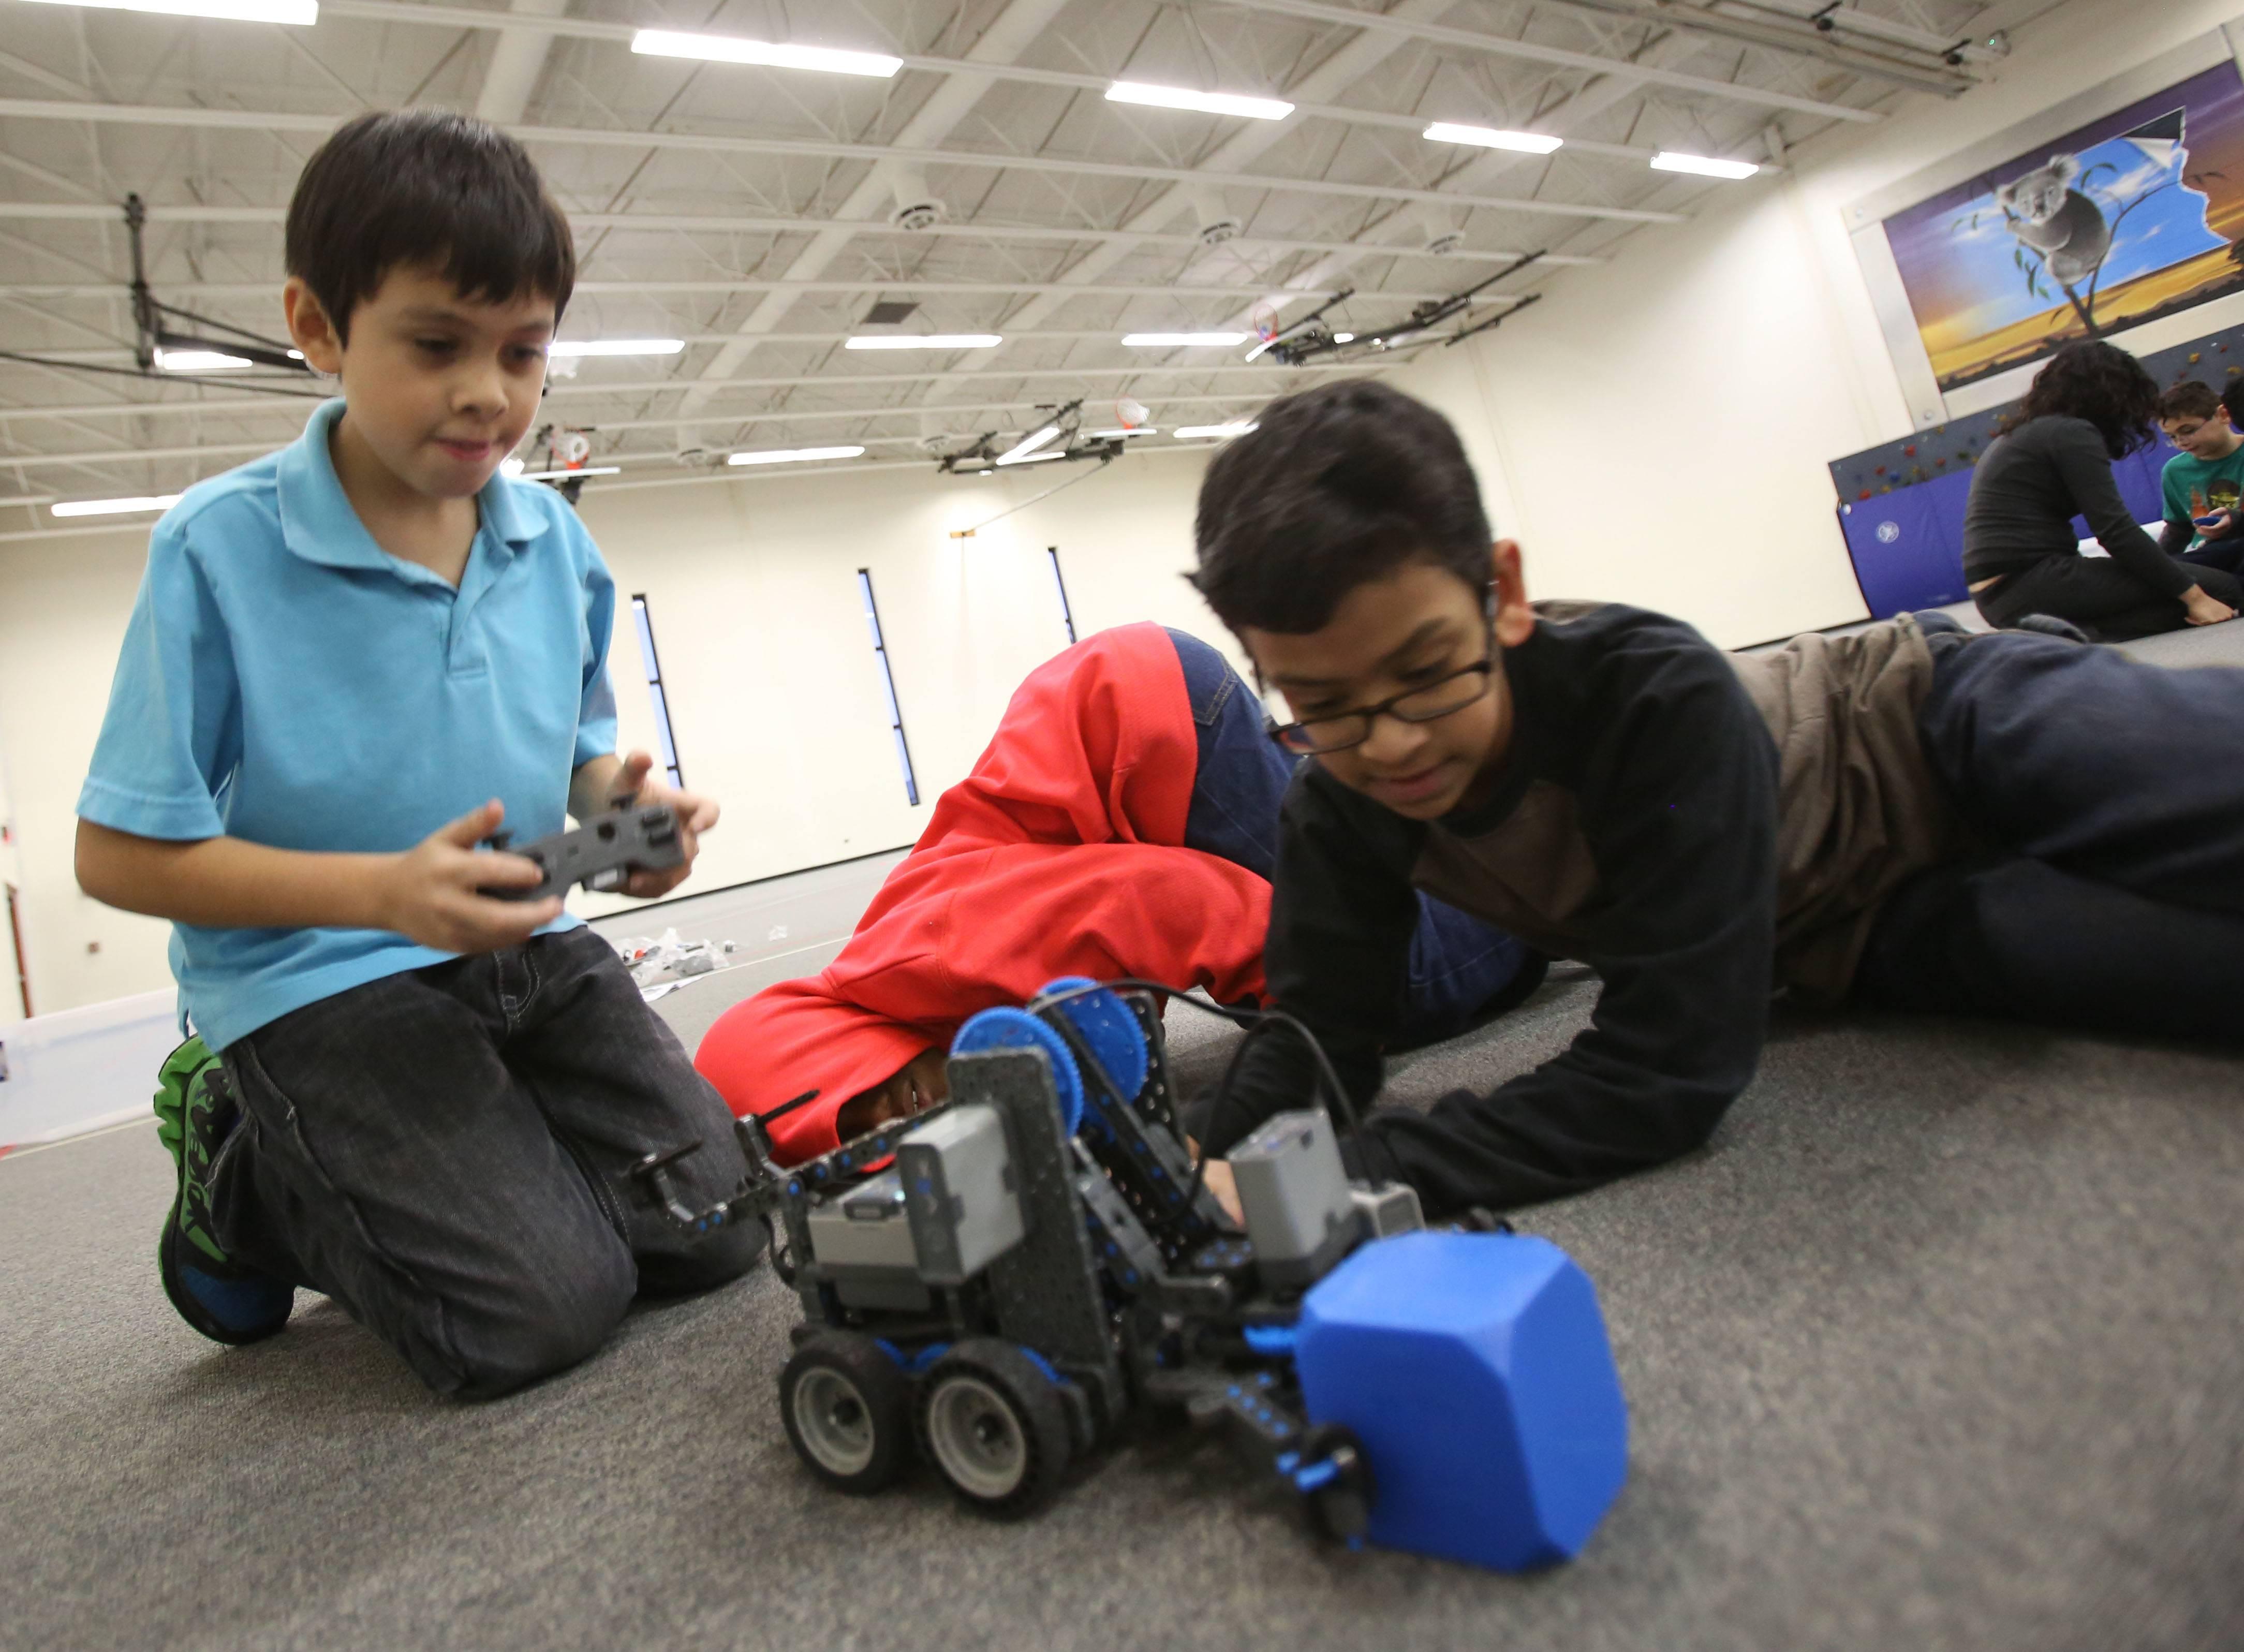 Naperville third-graders 'amazed' by new robotics club